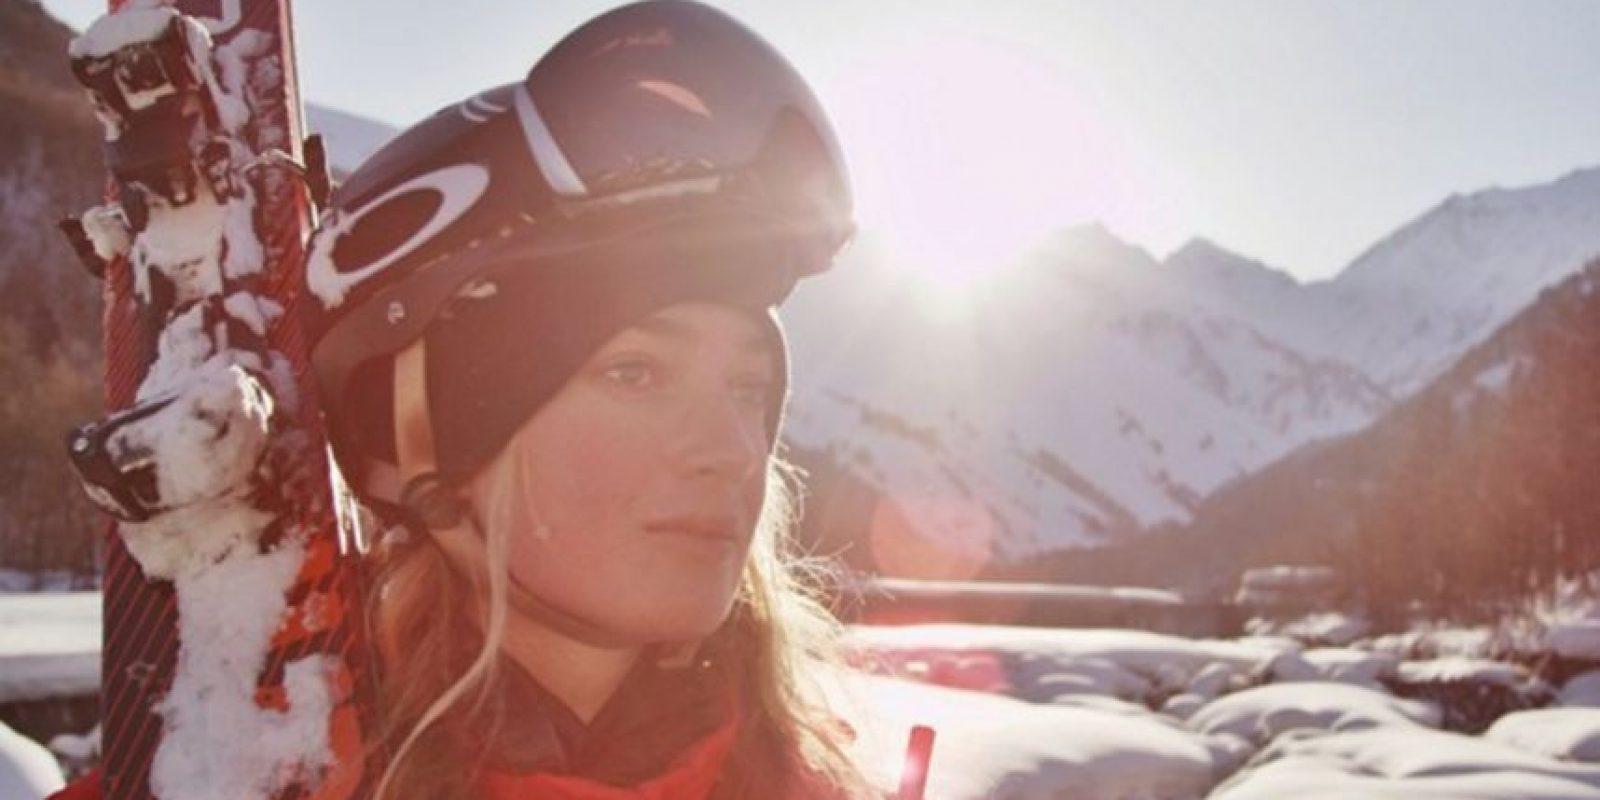 Es Sierra Quitiquit, esquiadora profesional Foto:Vía instagram.com/sierraquitiquit